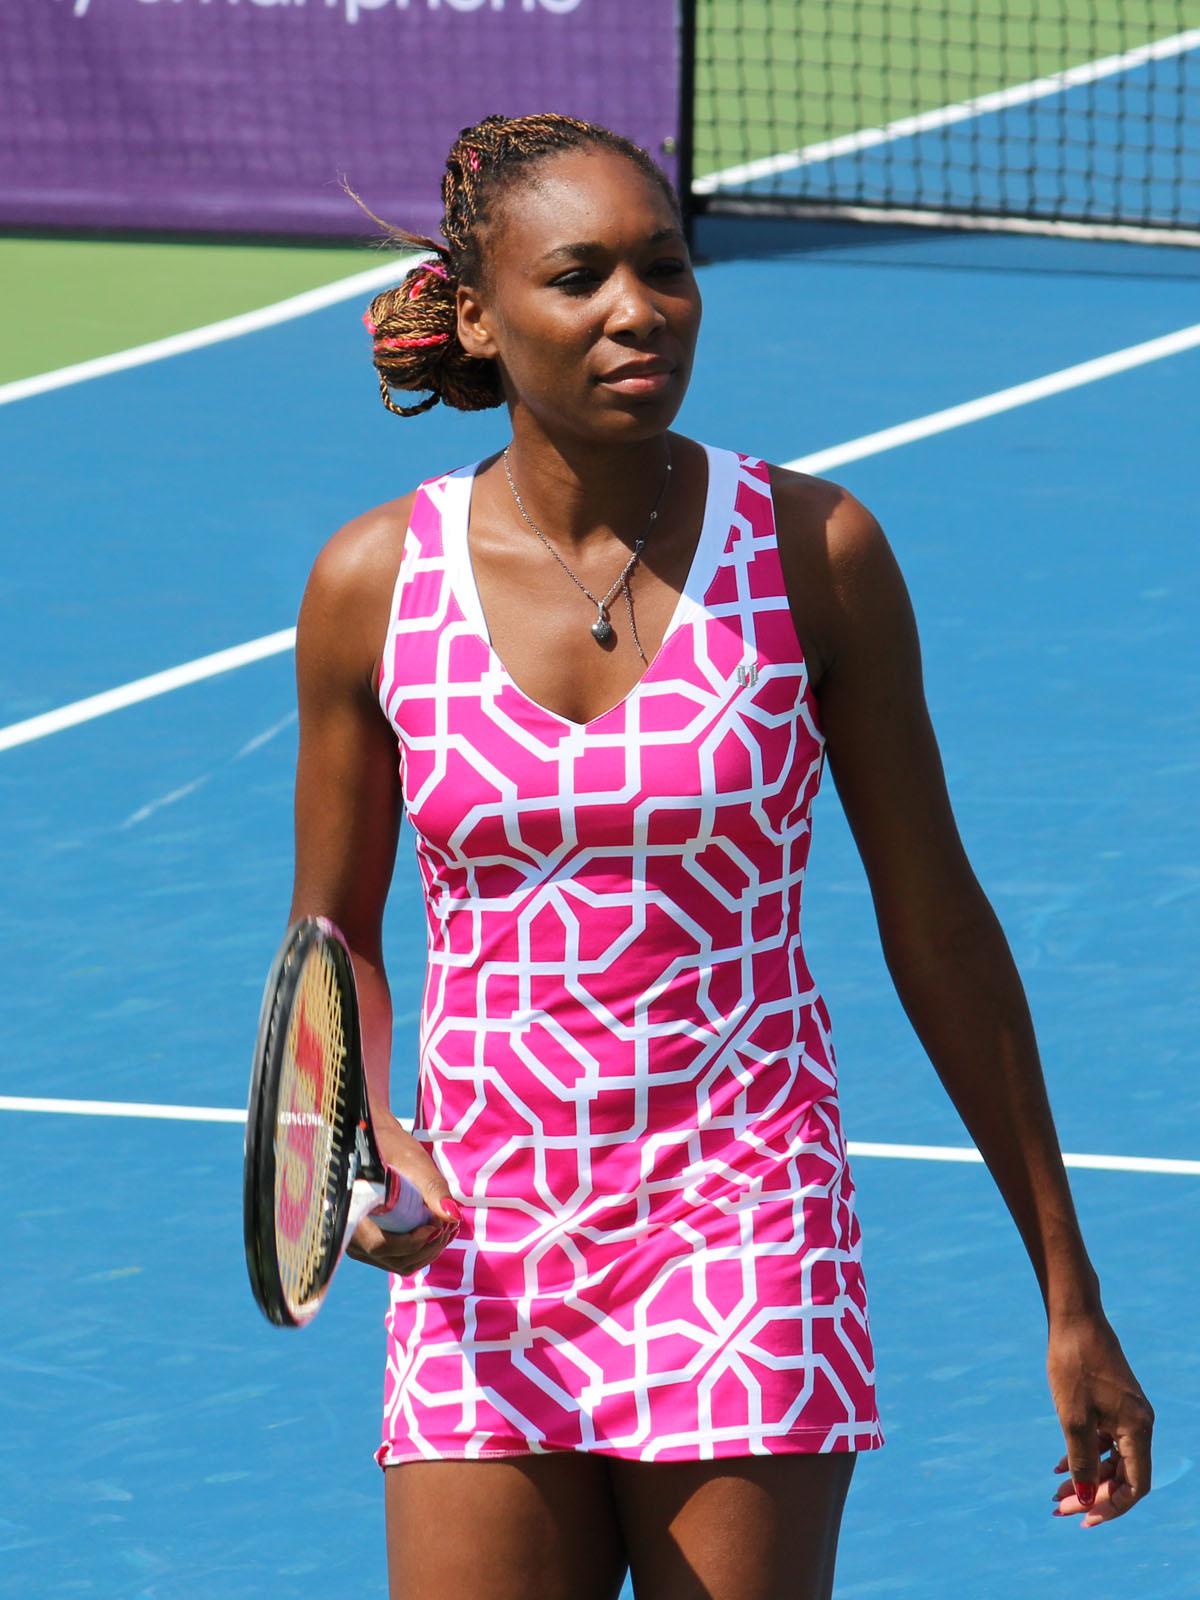 Sports News Roundup: Venus prevails in opening Cincinnati match; Osaka regains No. 1 spot in world rankings